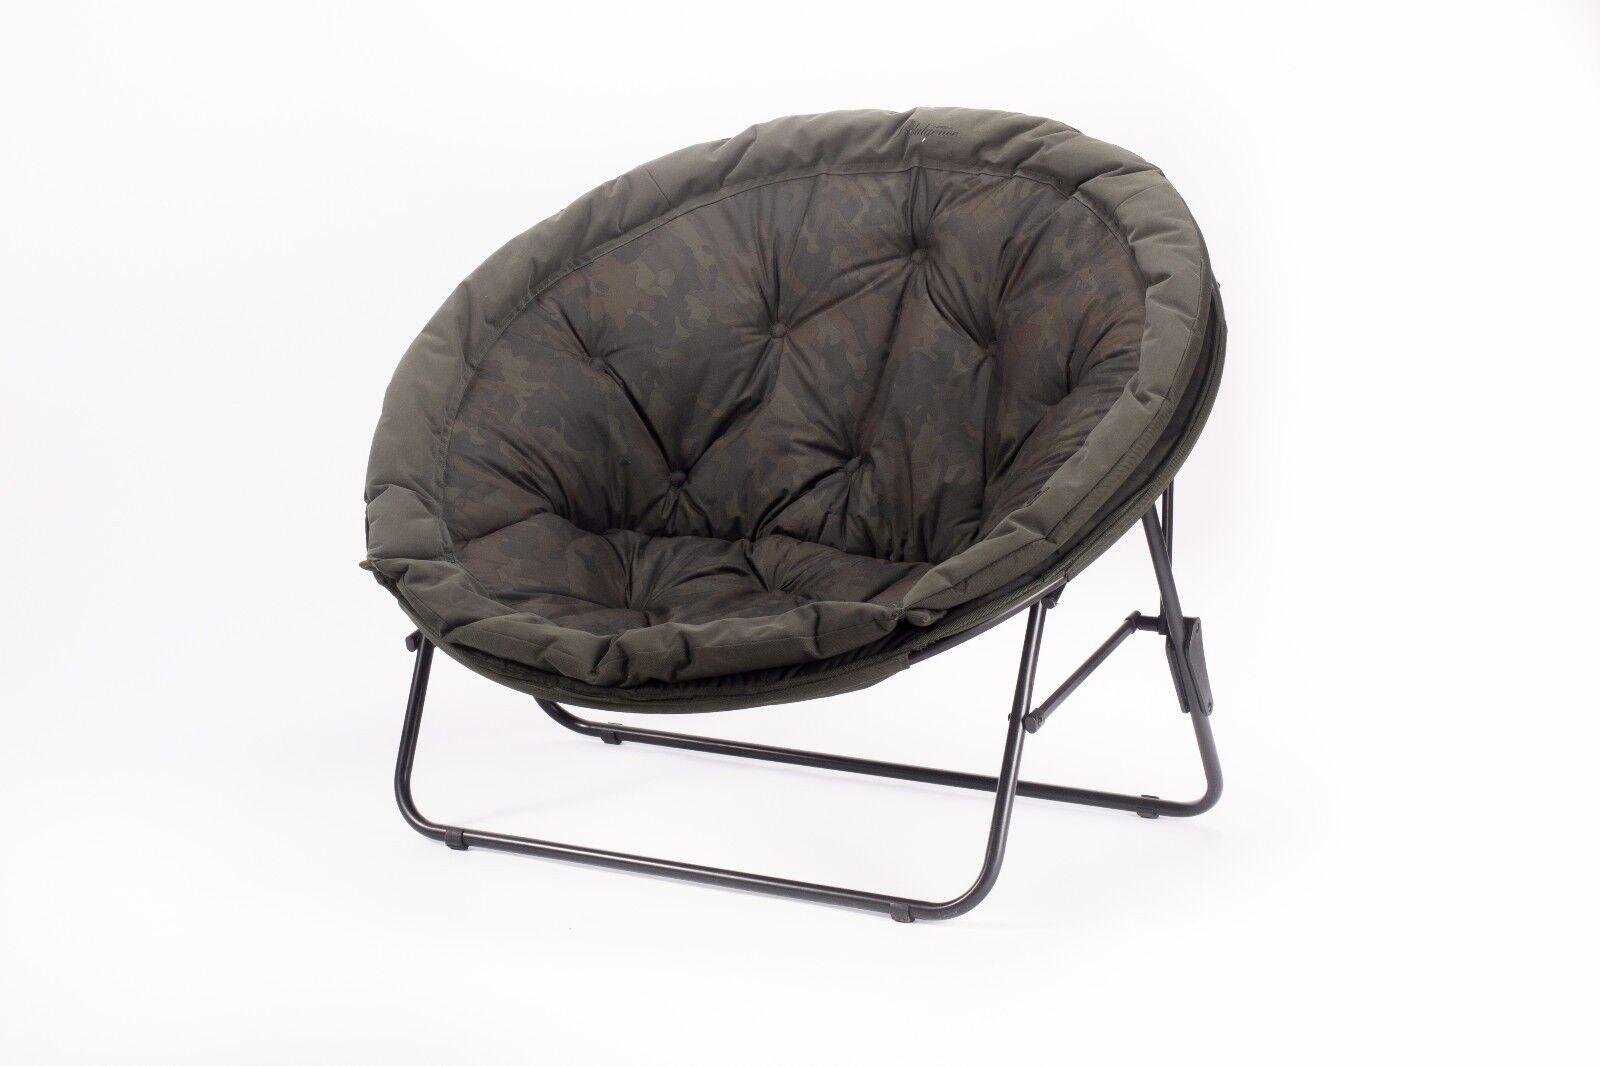 Nash Indulgence Niedrig Moon Chair NEW Carp Fishing Fishing Carp - T9755 170b66